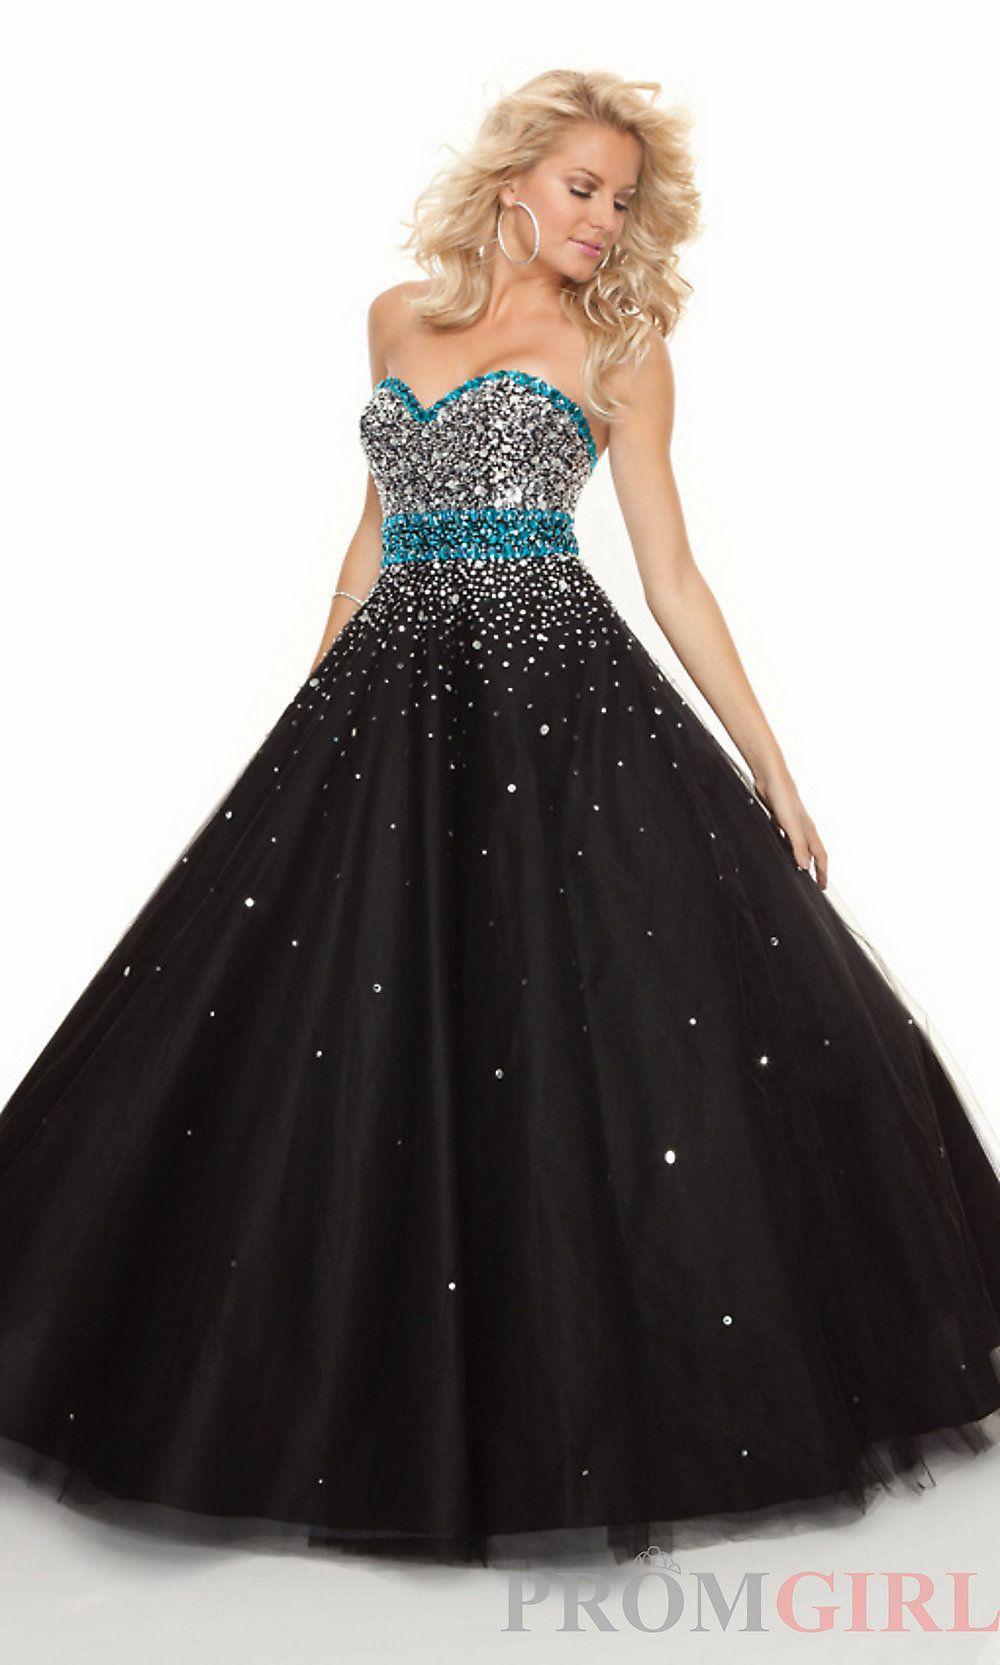 Ball gown dresses for girls beaded black ball gowns mori lee